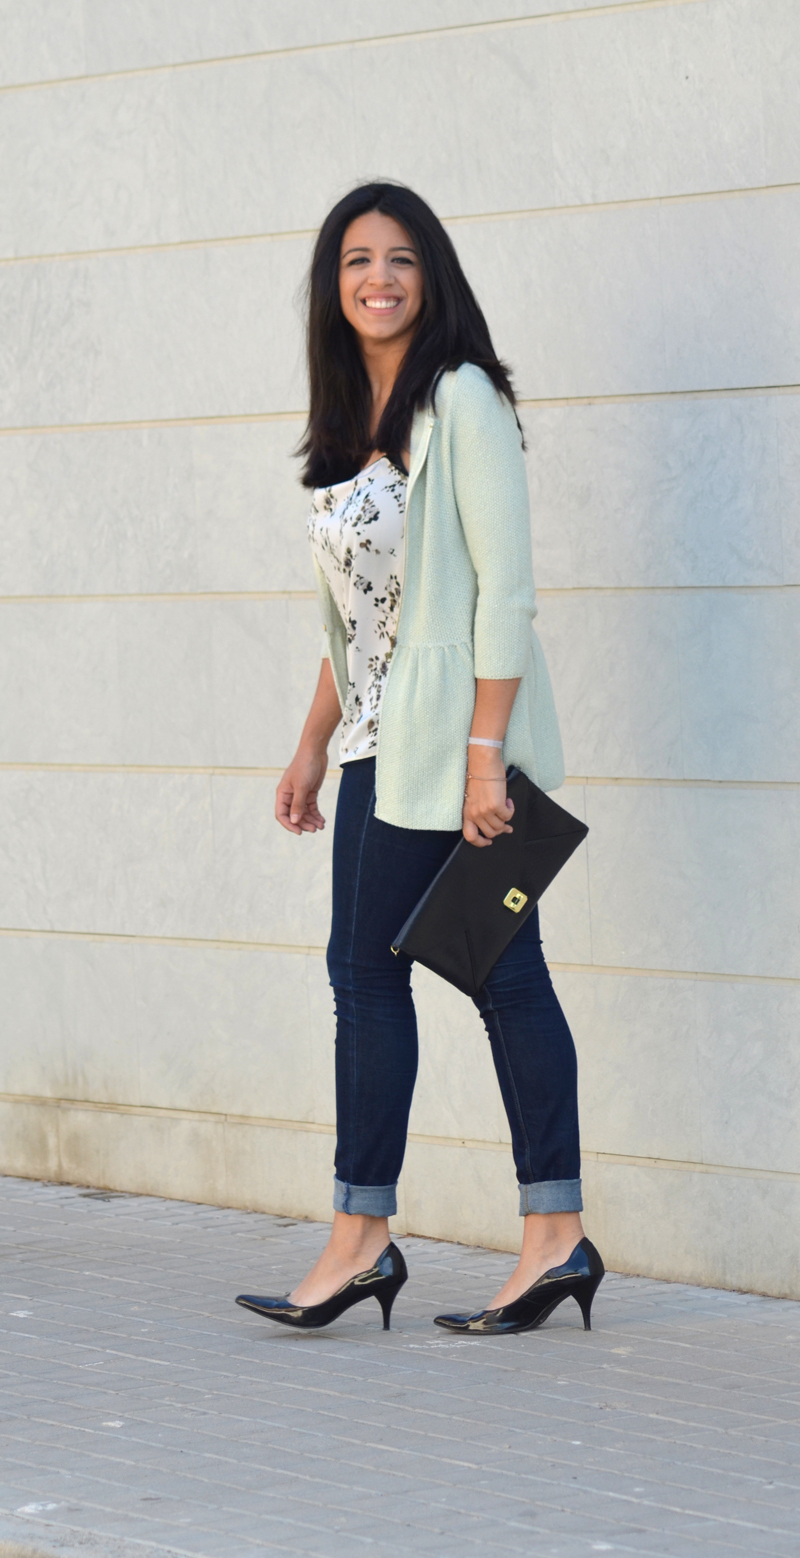 florenciablog working girl mint inspiration fashion blogger spain clutch zara look  (9)